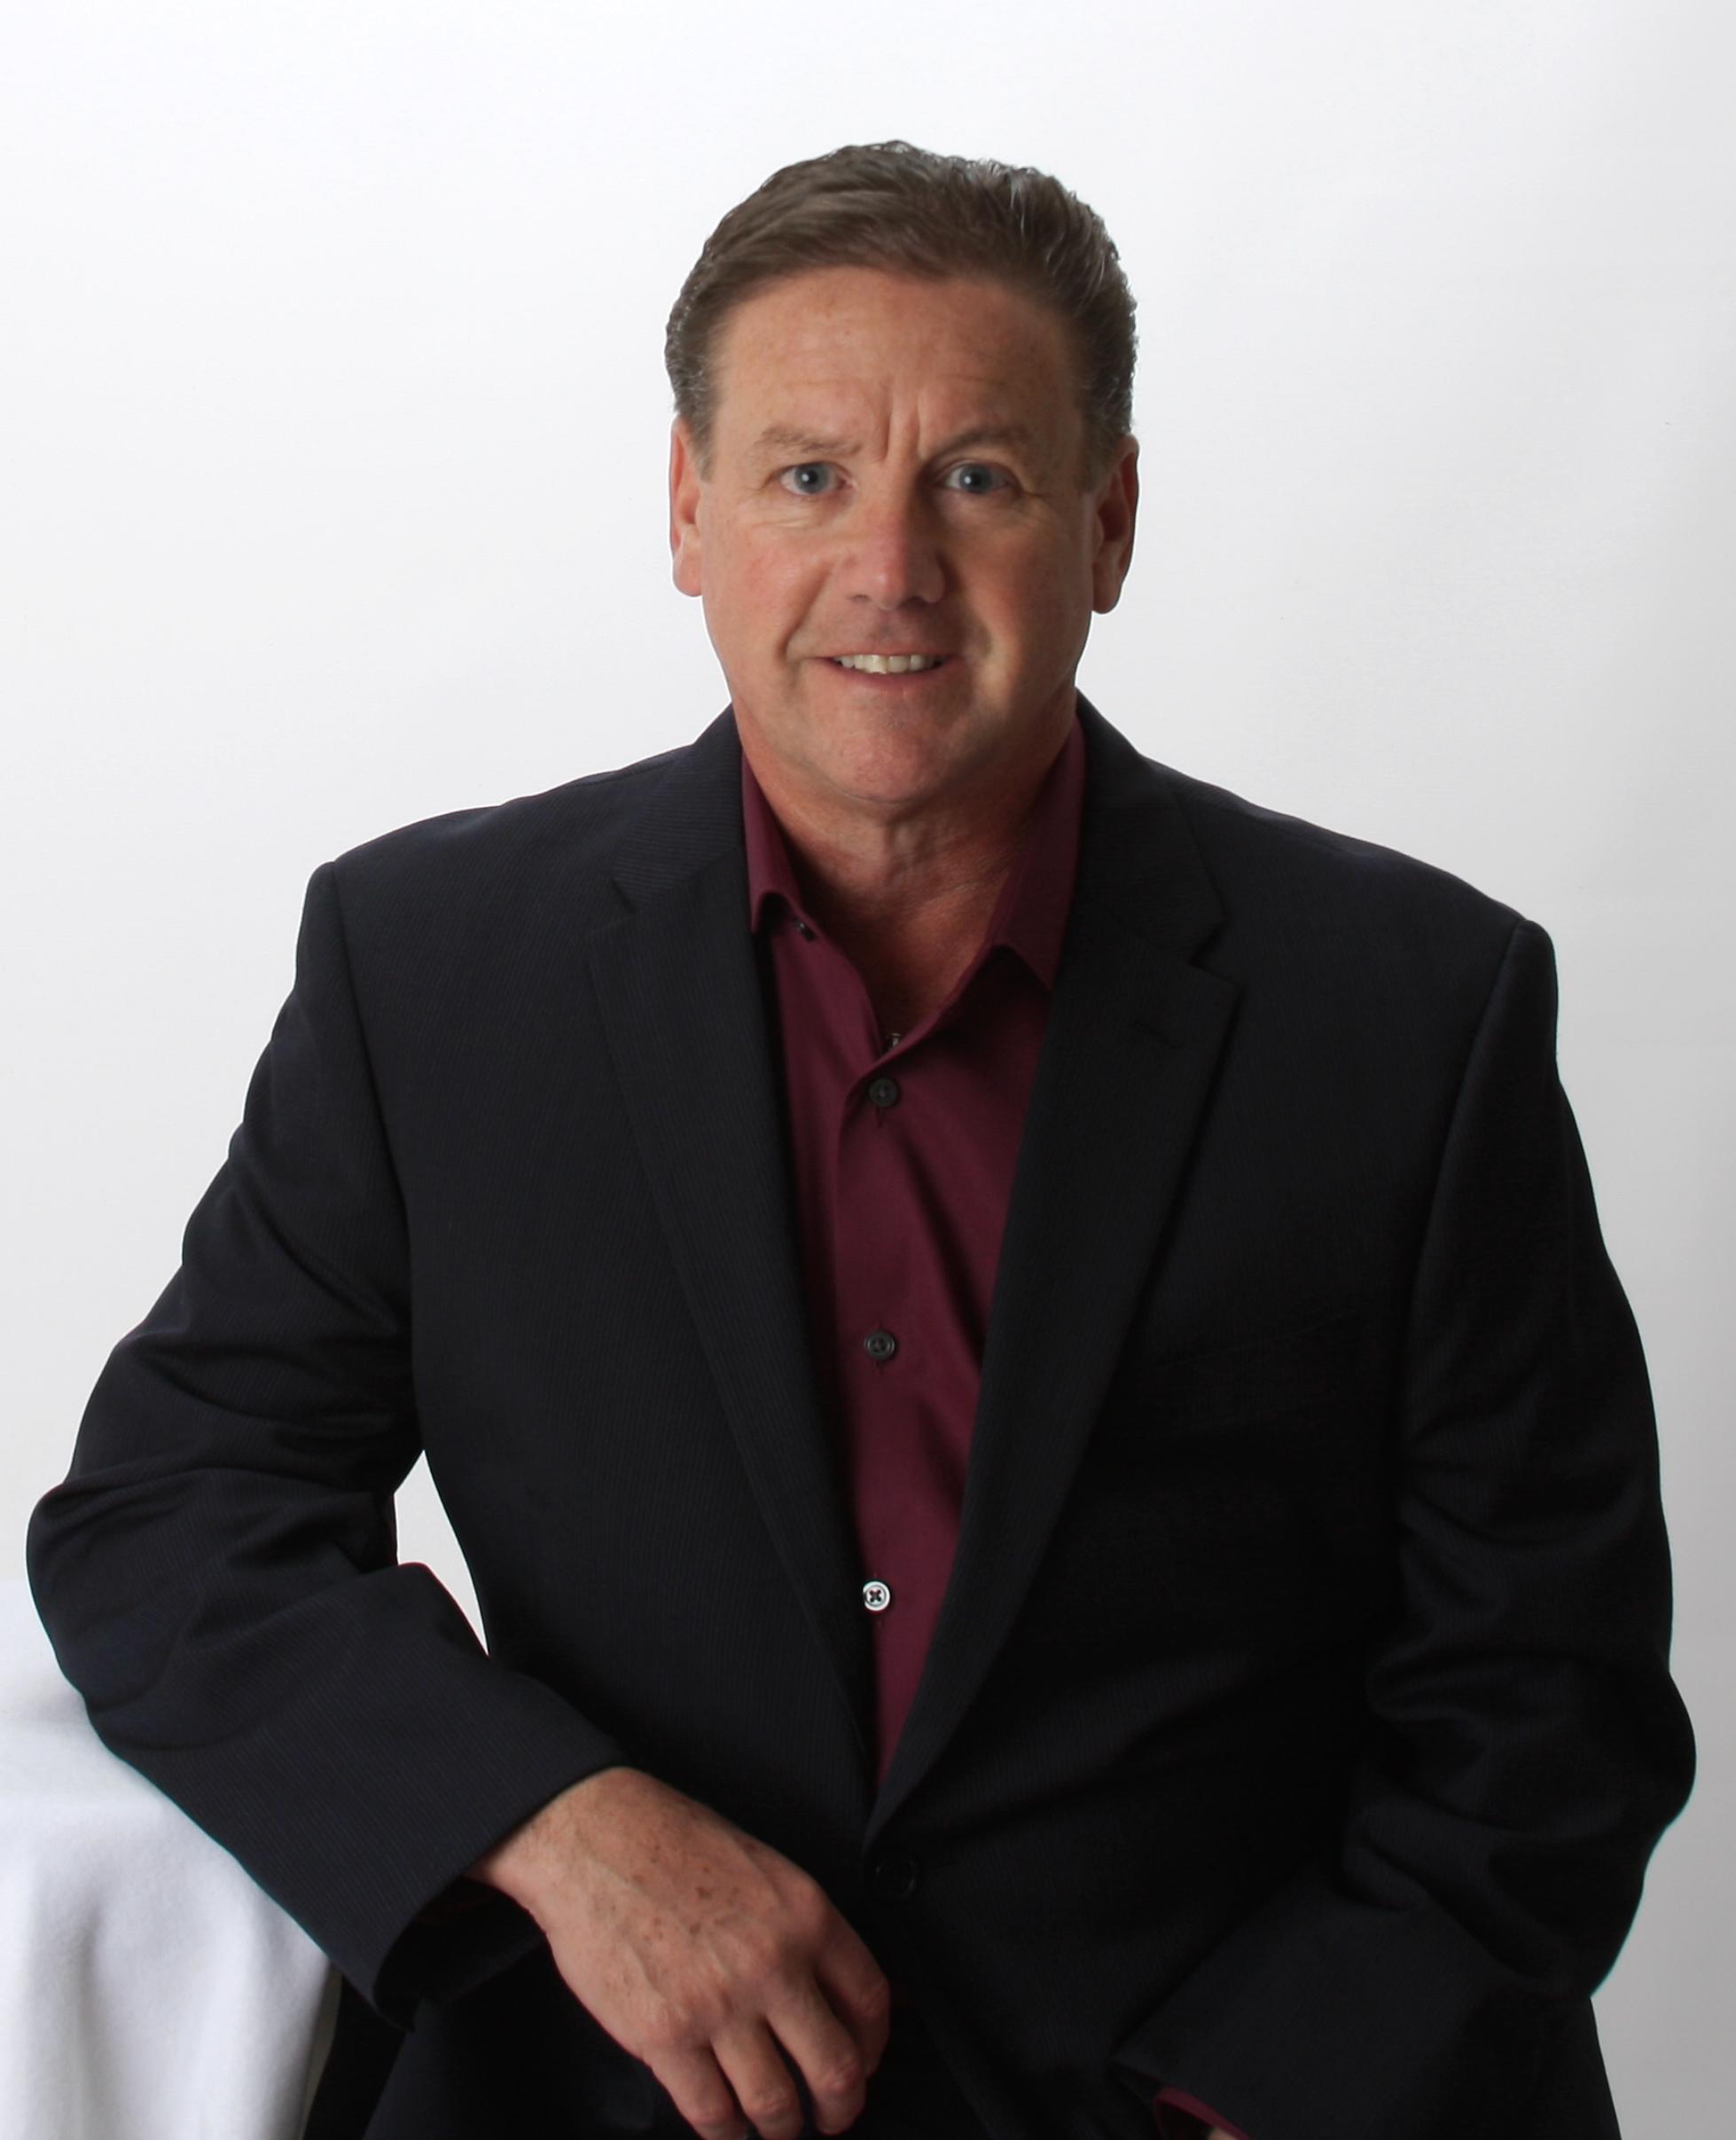 Shaun Radcliffe, Real Estate Agent - Yorba Linda, CA